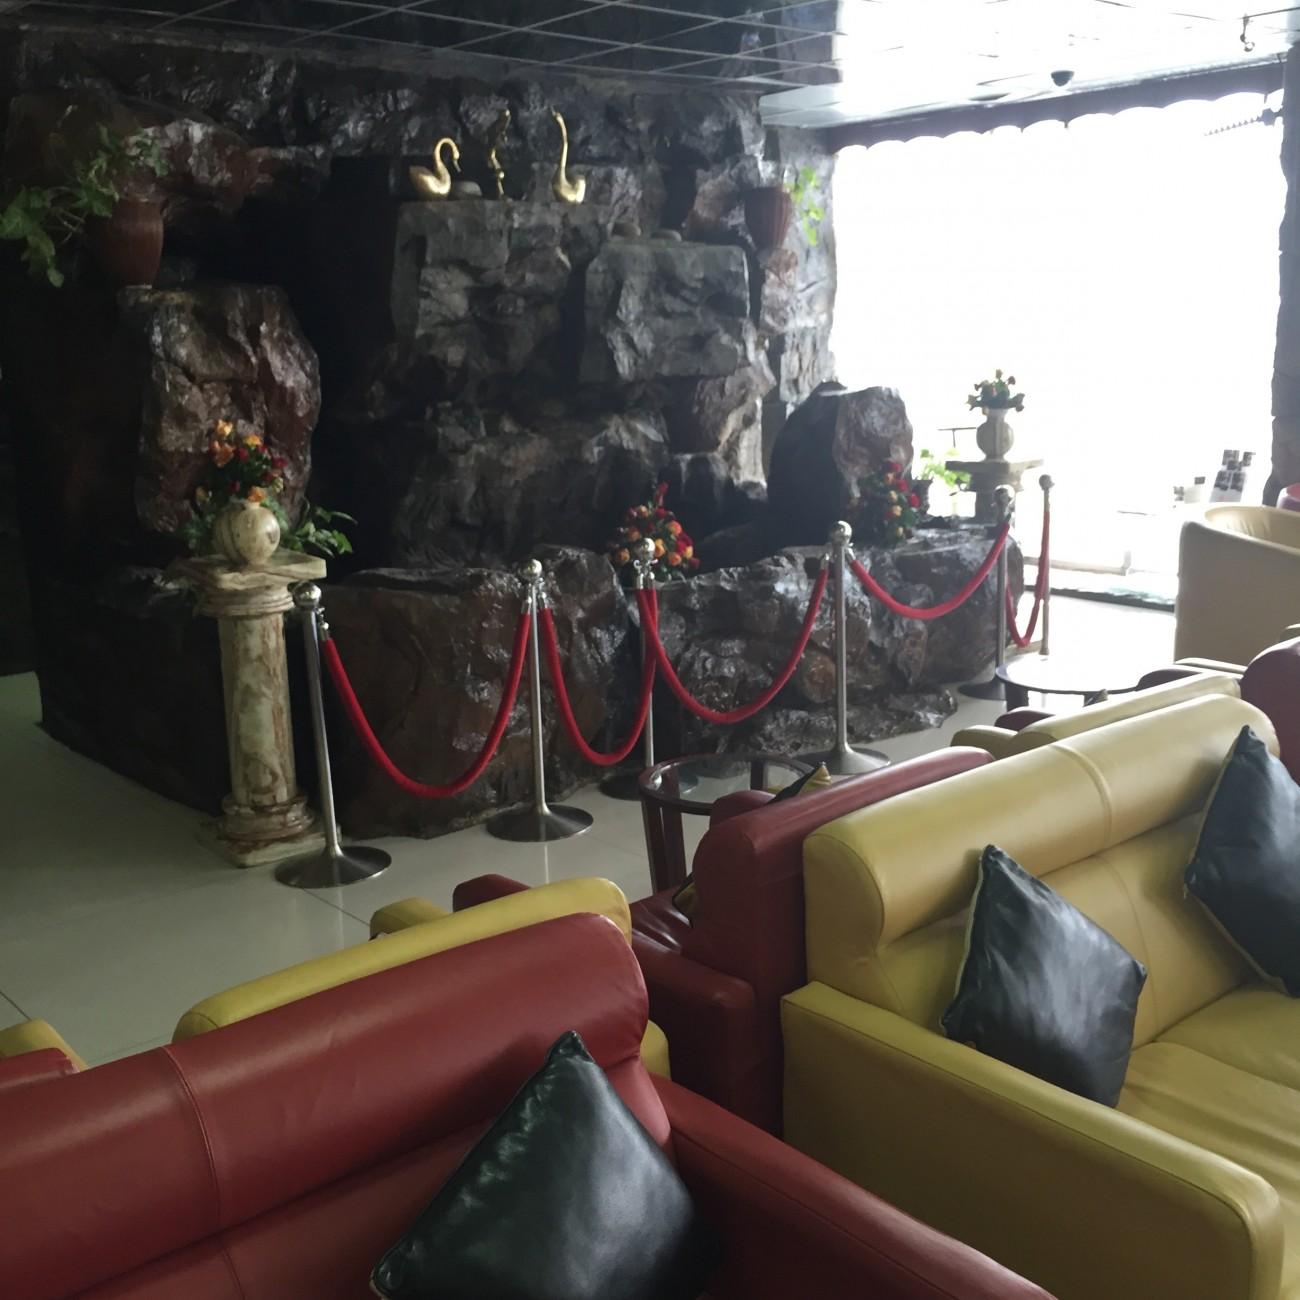 Tanzania Lounge Dar Es Salaam - 09